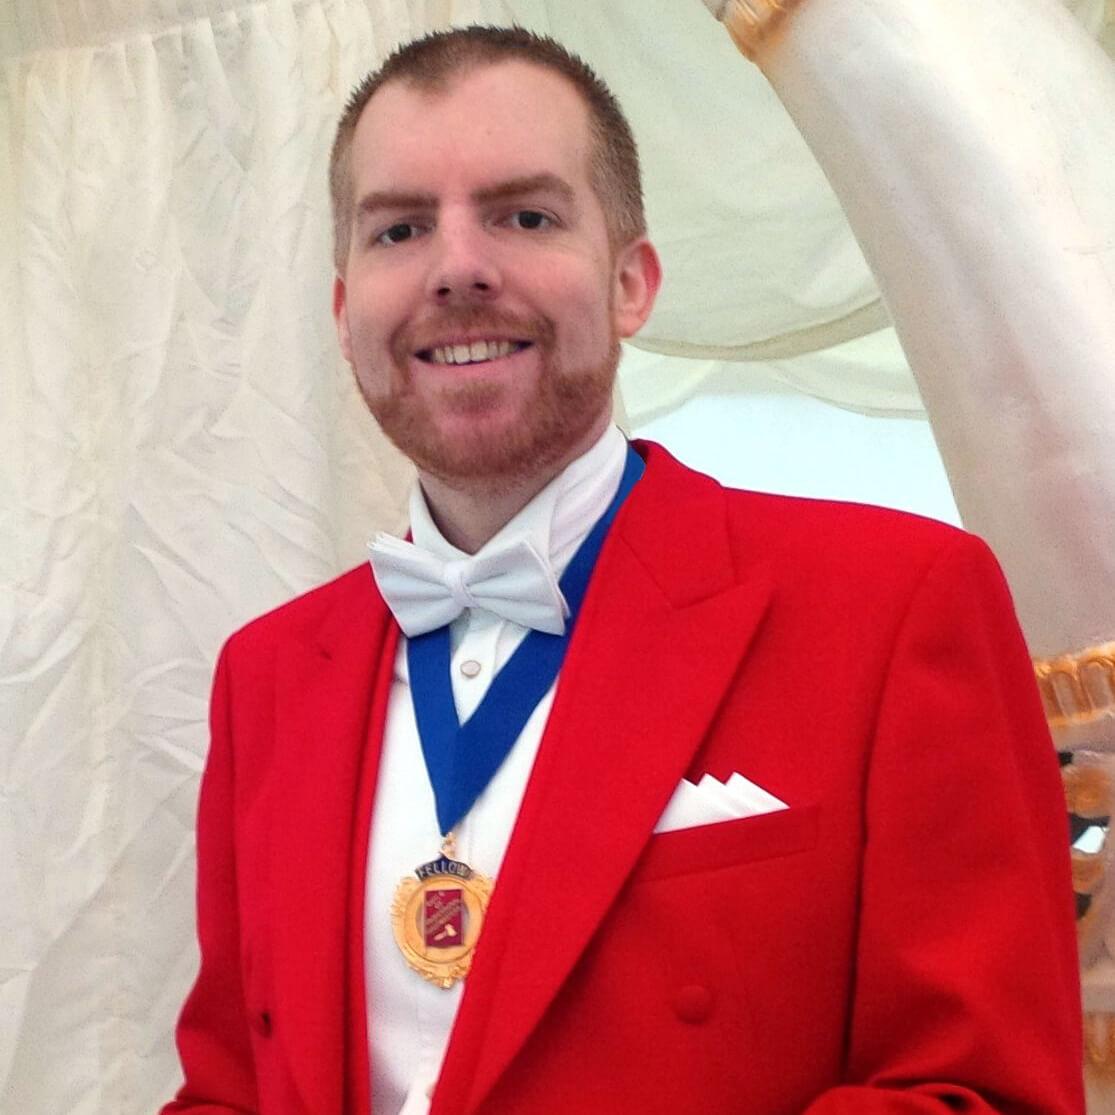 Professional Toastmaster and Master of Ceremonies Suffolk - Dan Heath